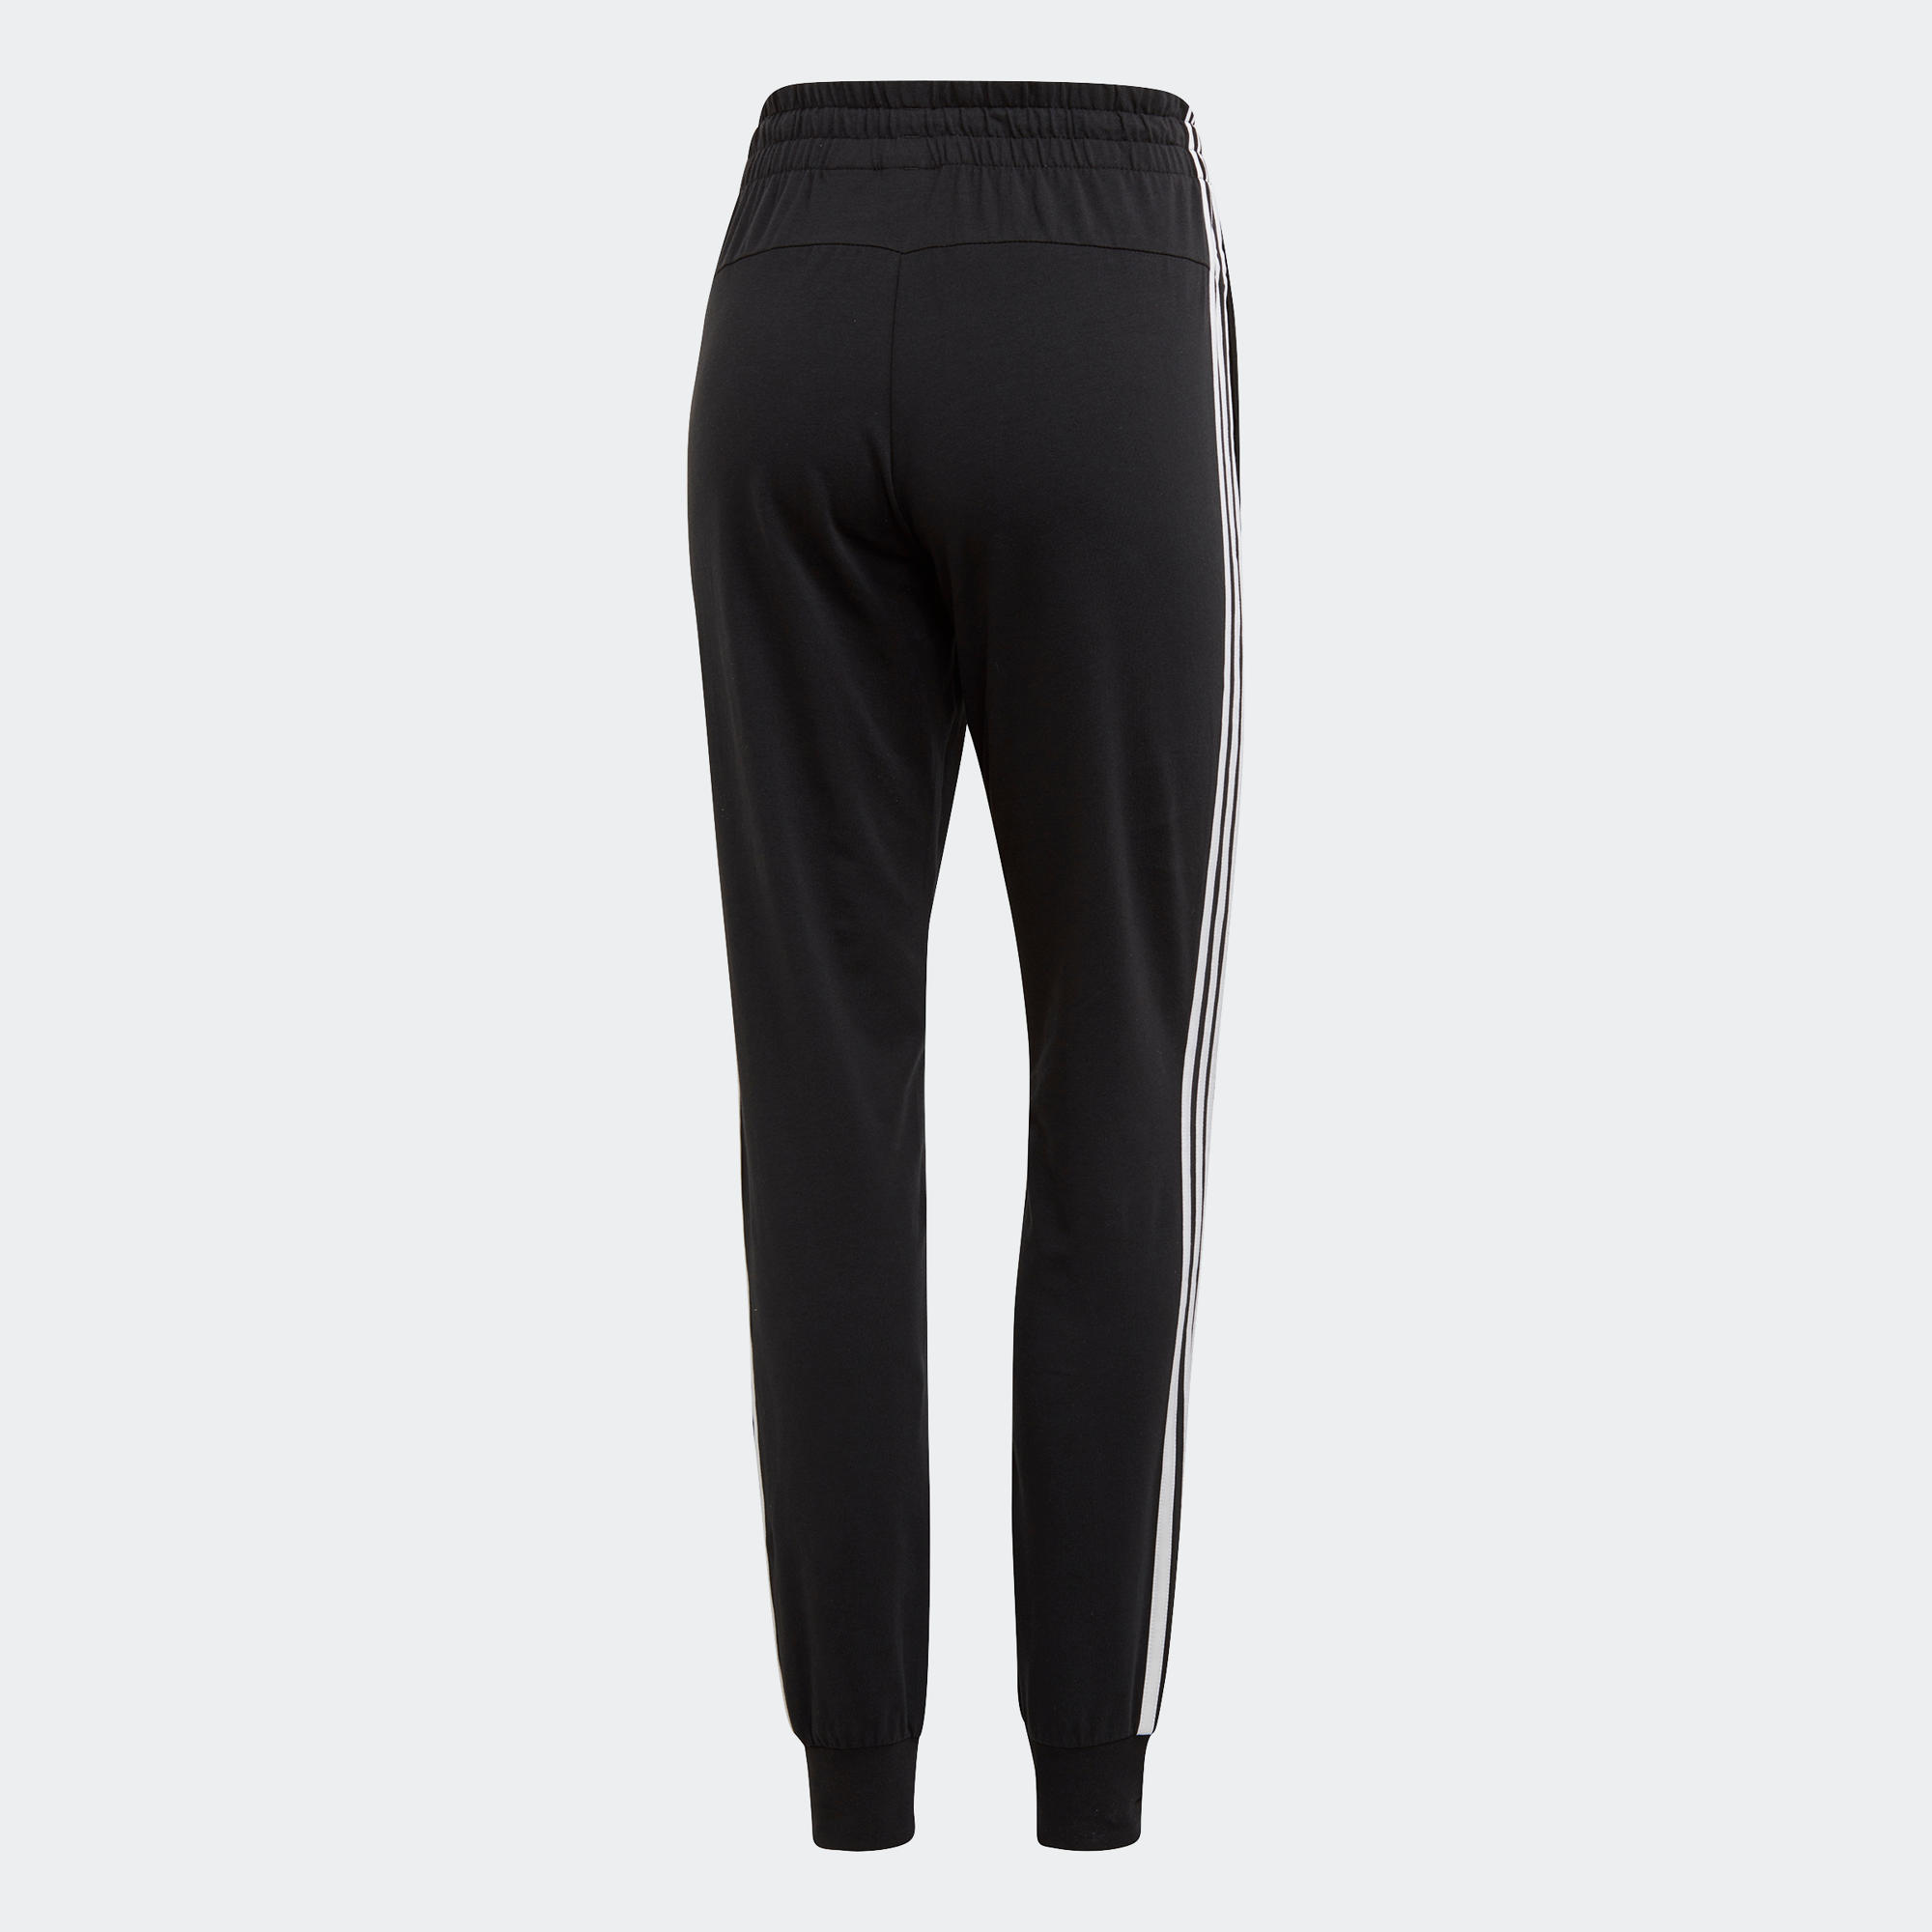 pantaloni tuta donna adidas felpati